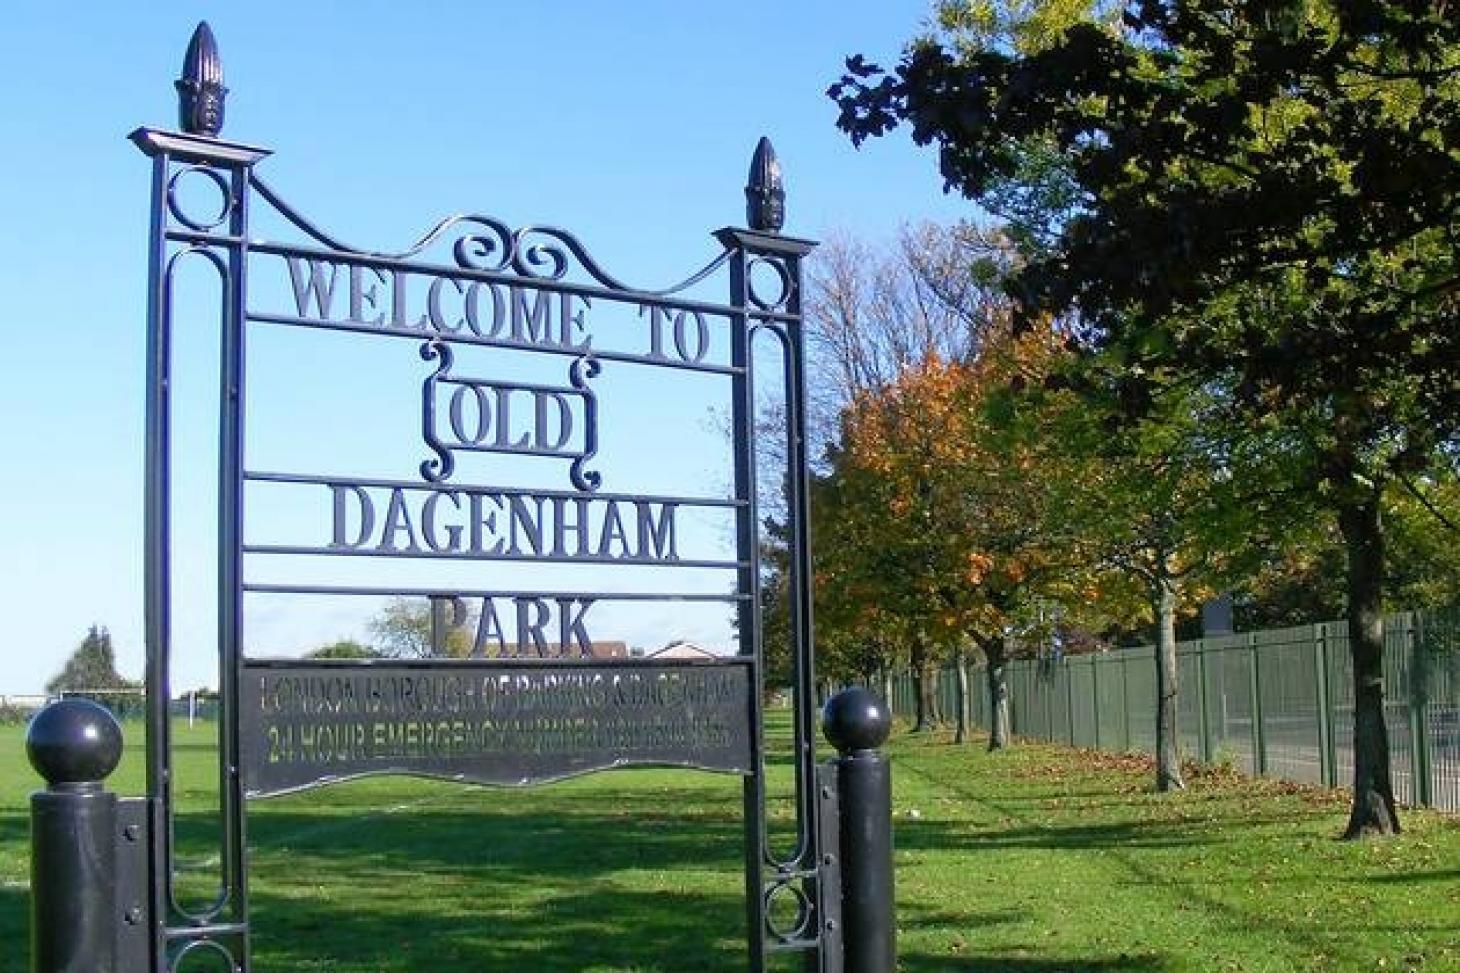 Old Dagenham Park Outdoor | Hard (macadam) tennis court